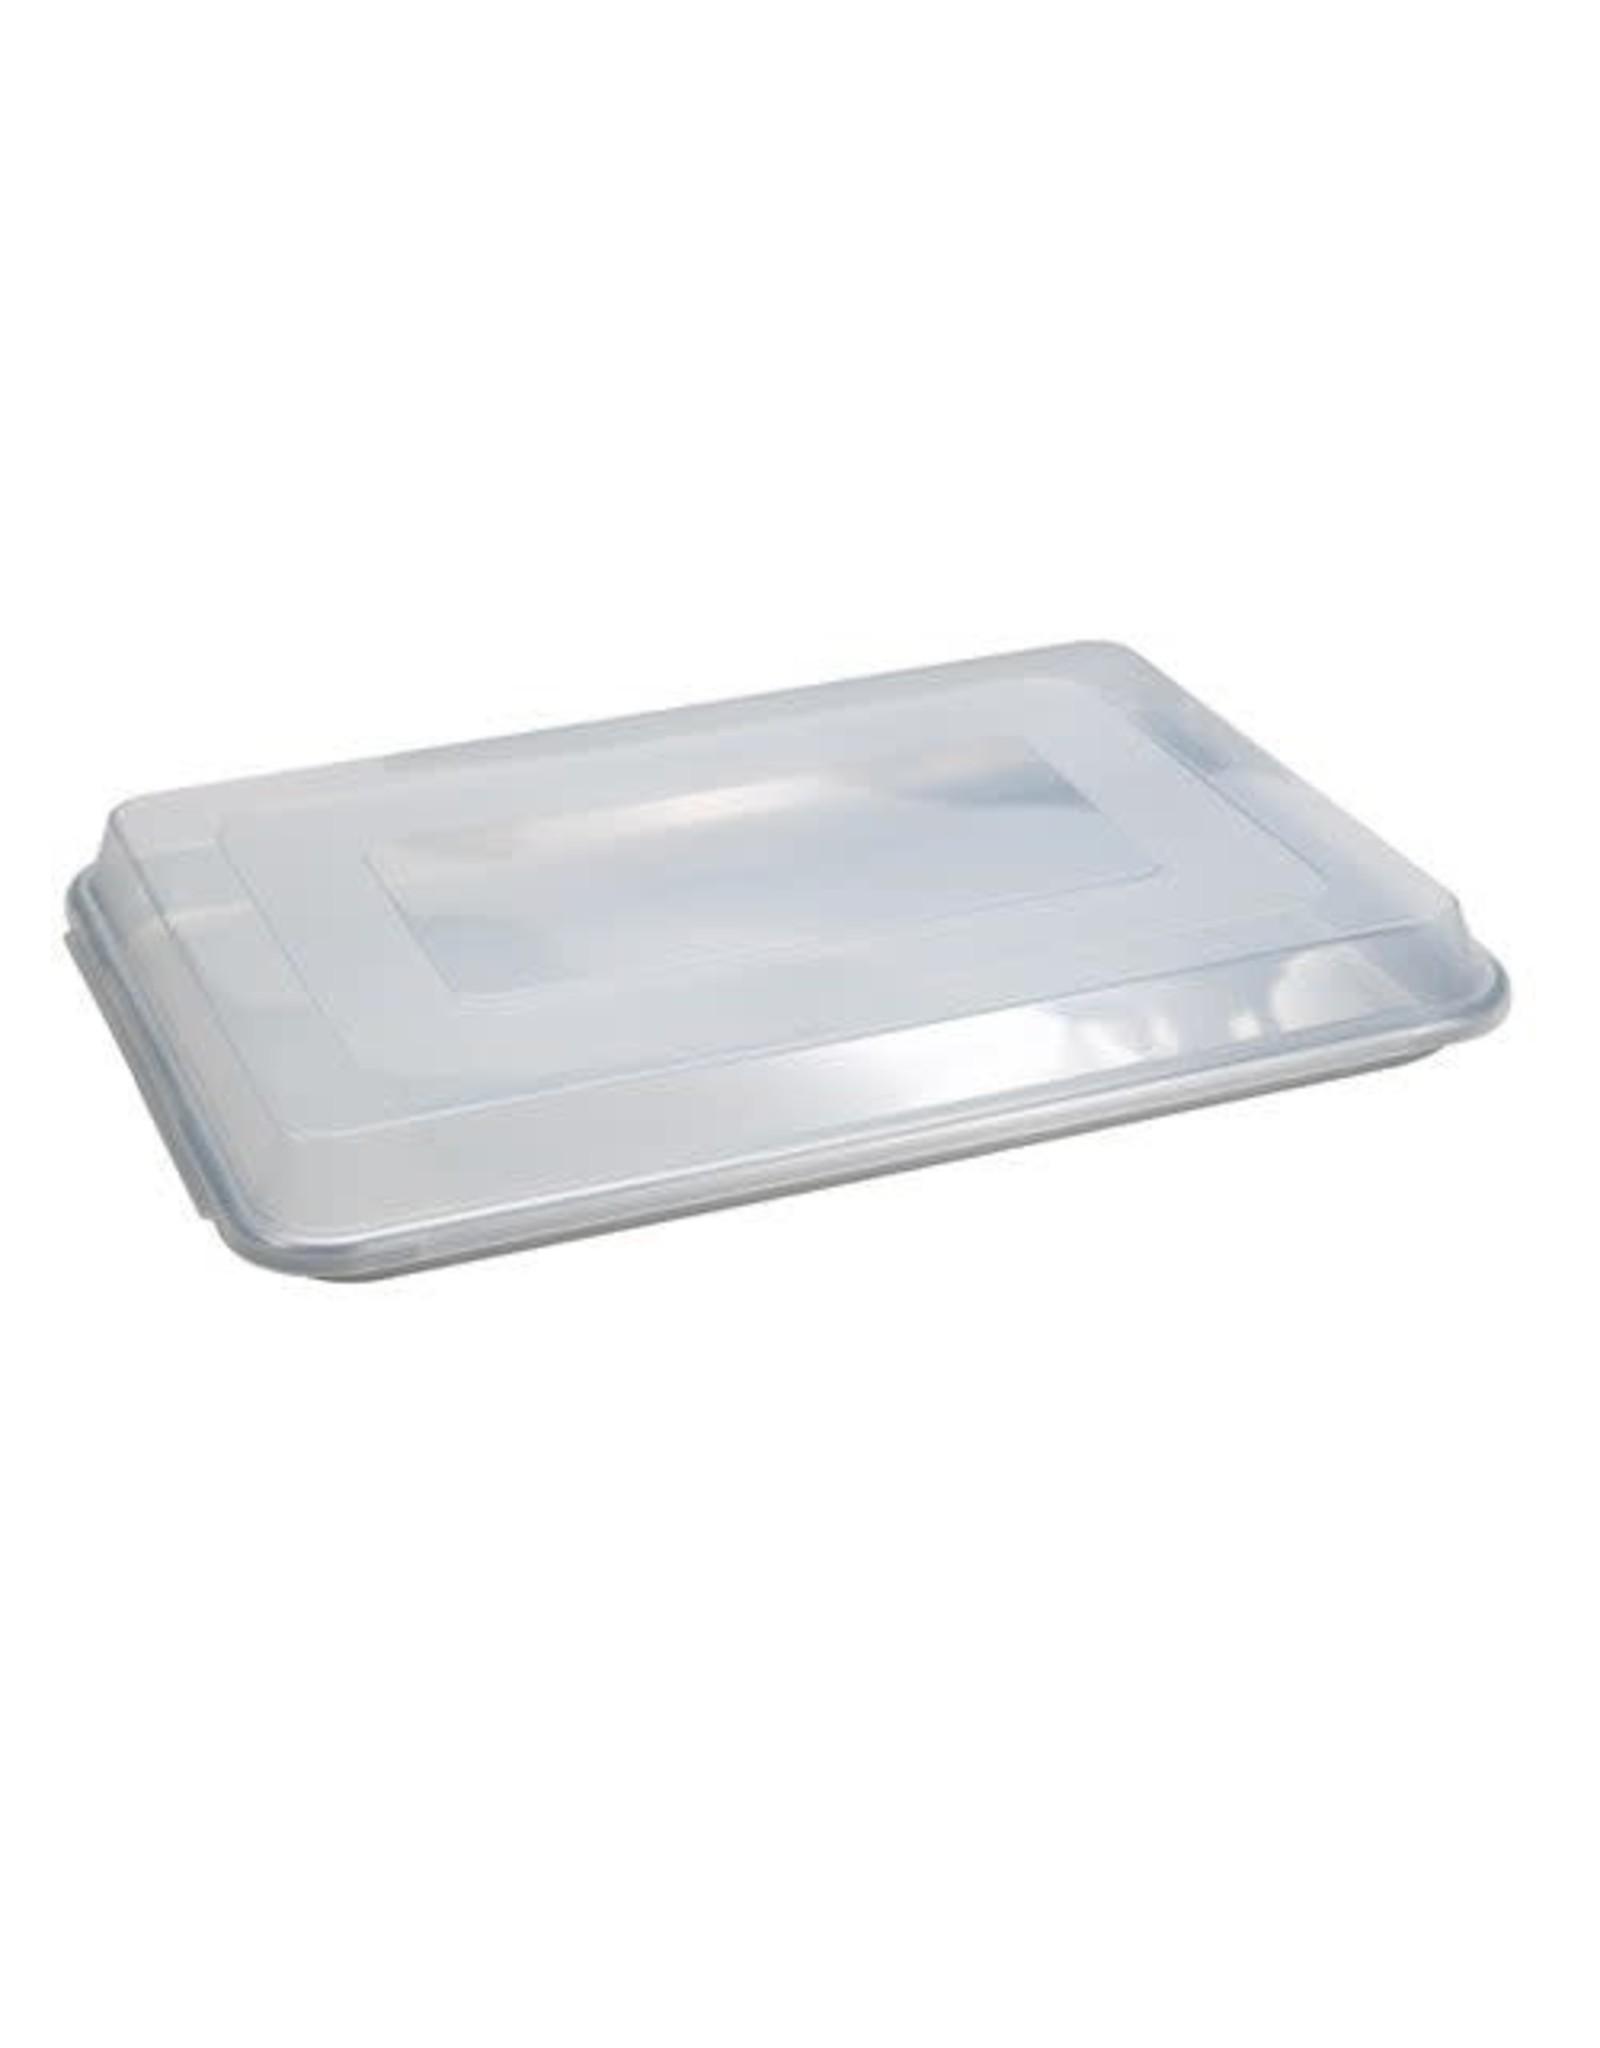 Nordic Ware 1/2 Sheet Pan w/Lid, 13x18